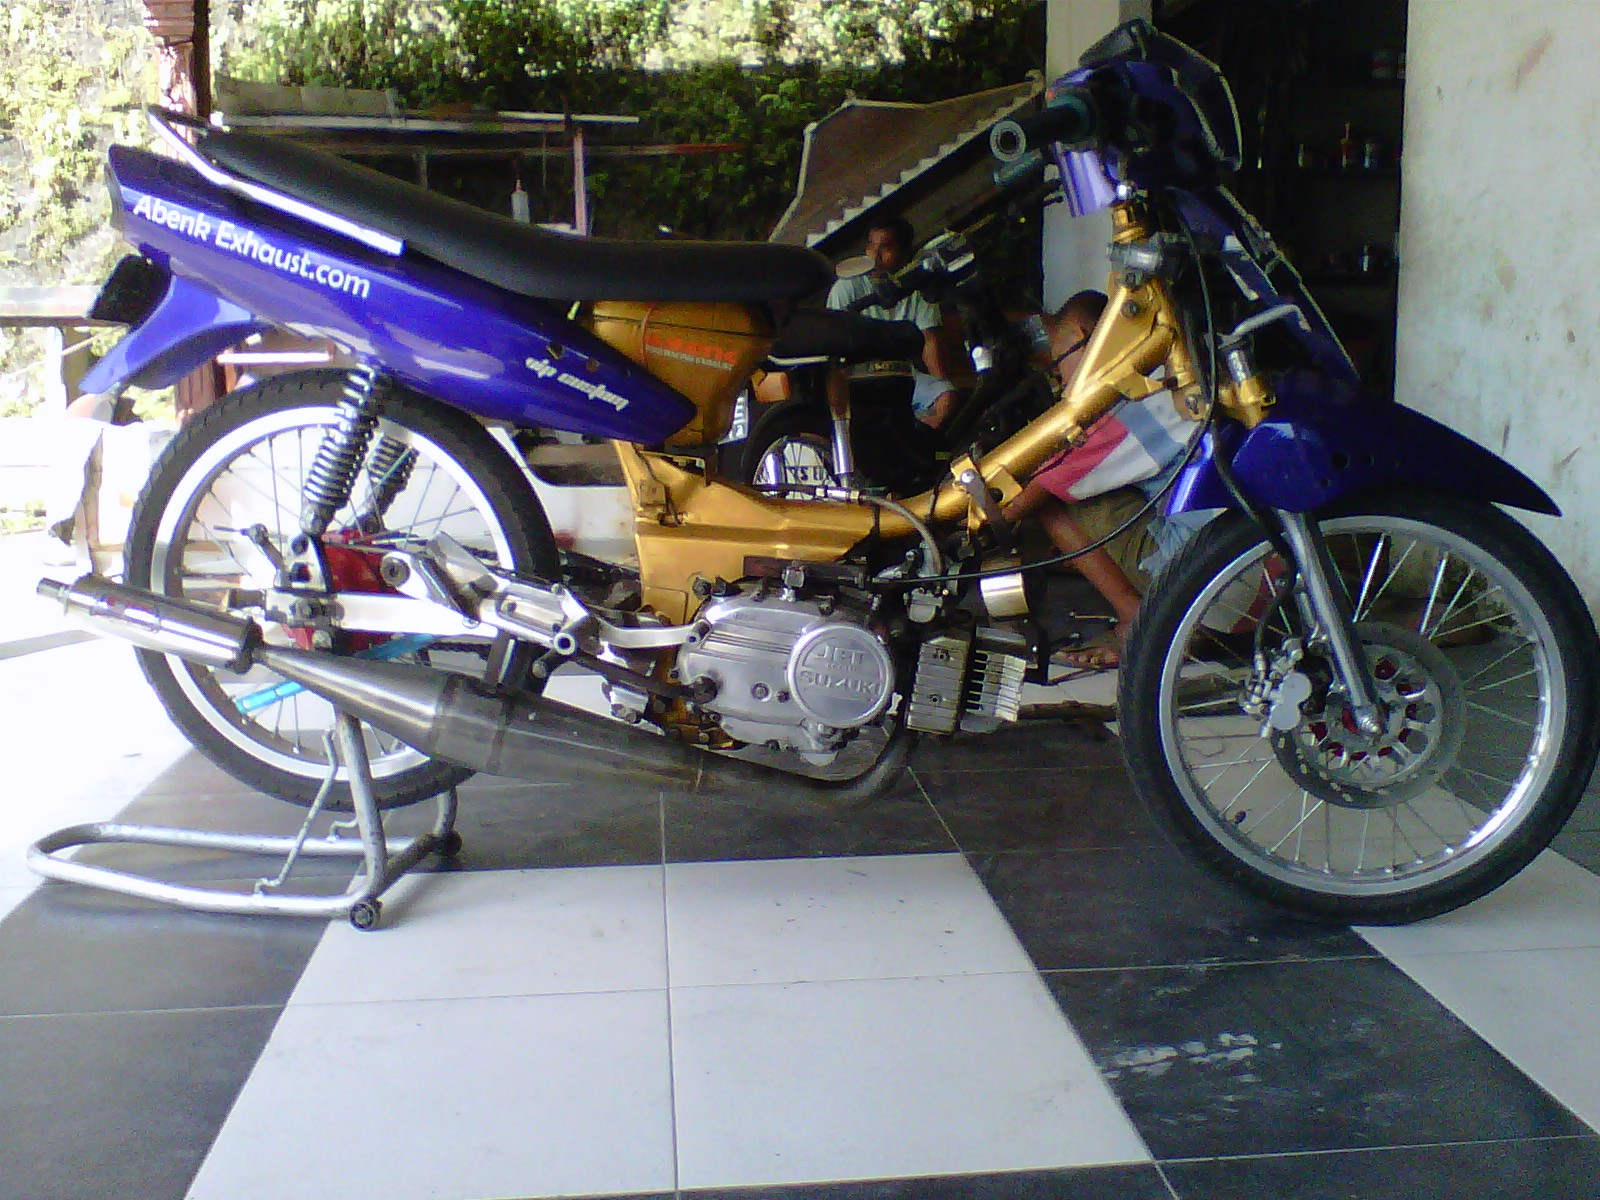 Modif Motor Suzuki Jet Kolet Wacana Modif Motor